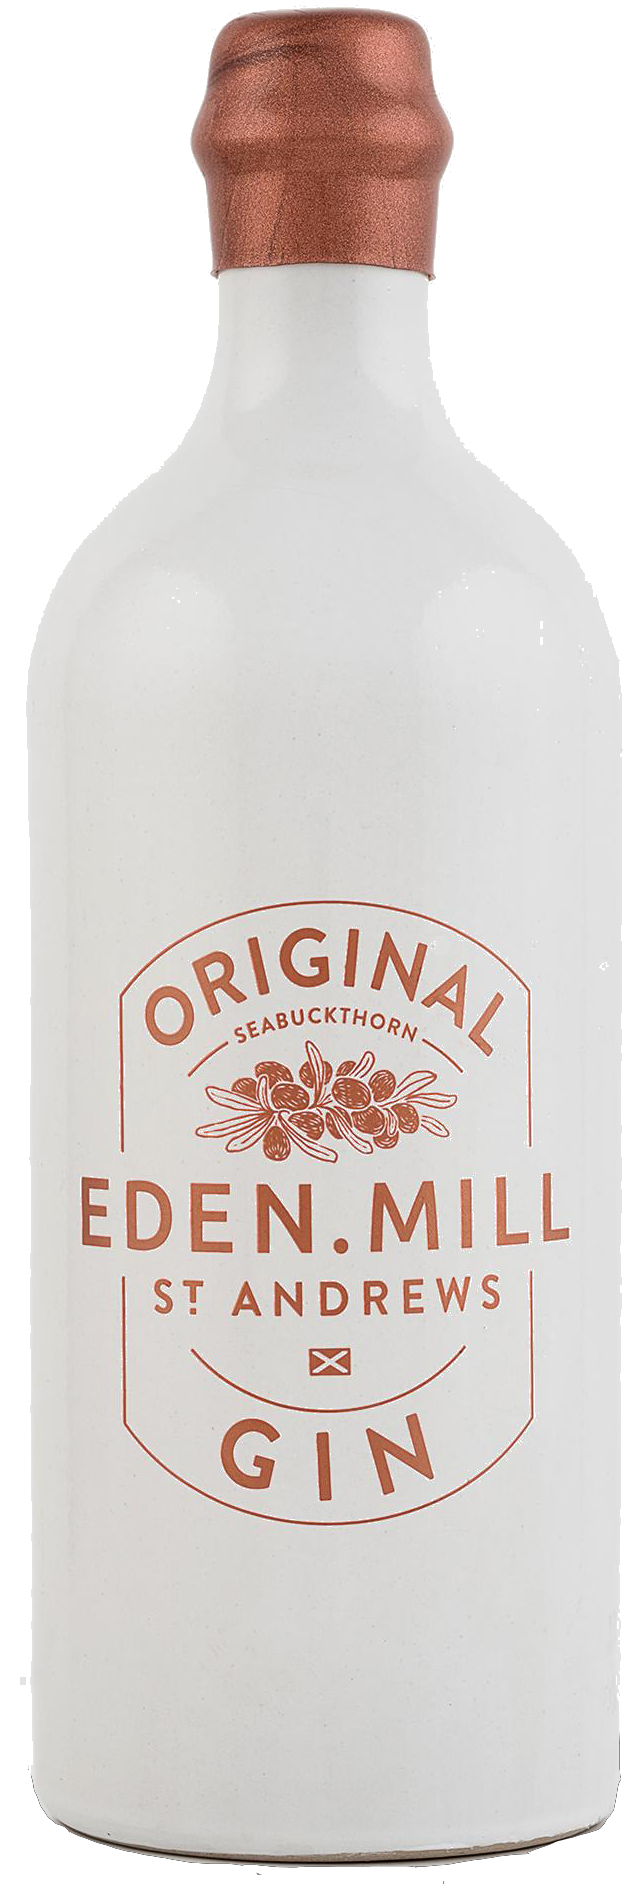 Original Gin . Seabuckthorn Berry . 700ml . €43